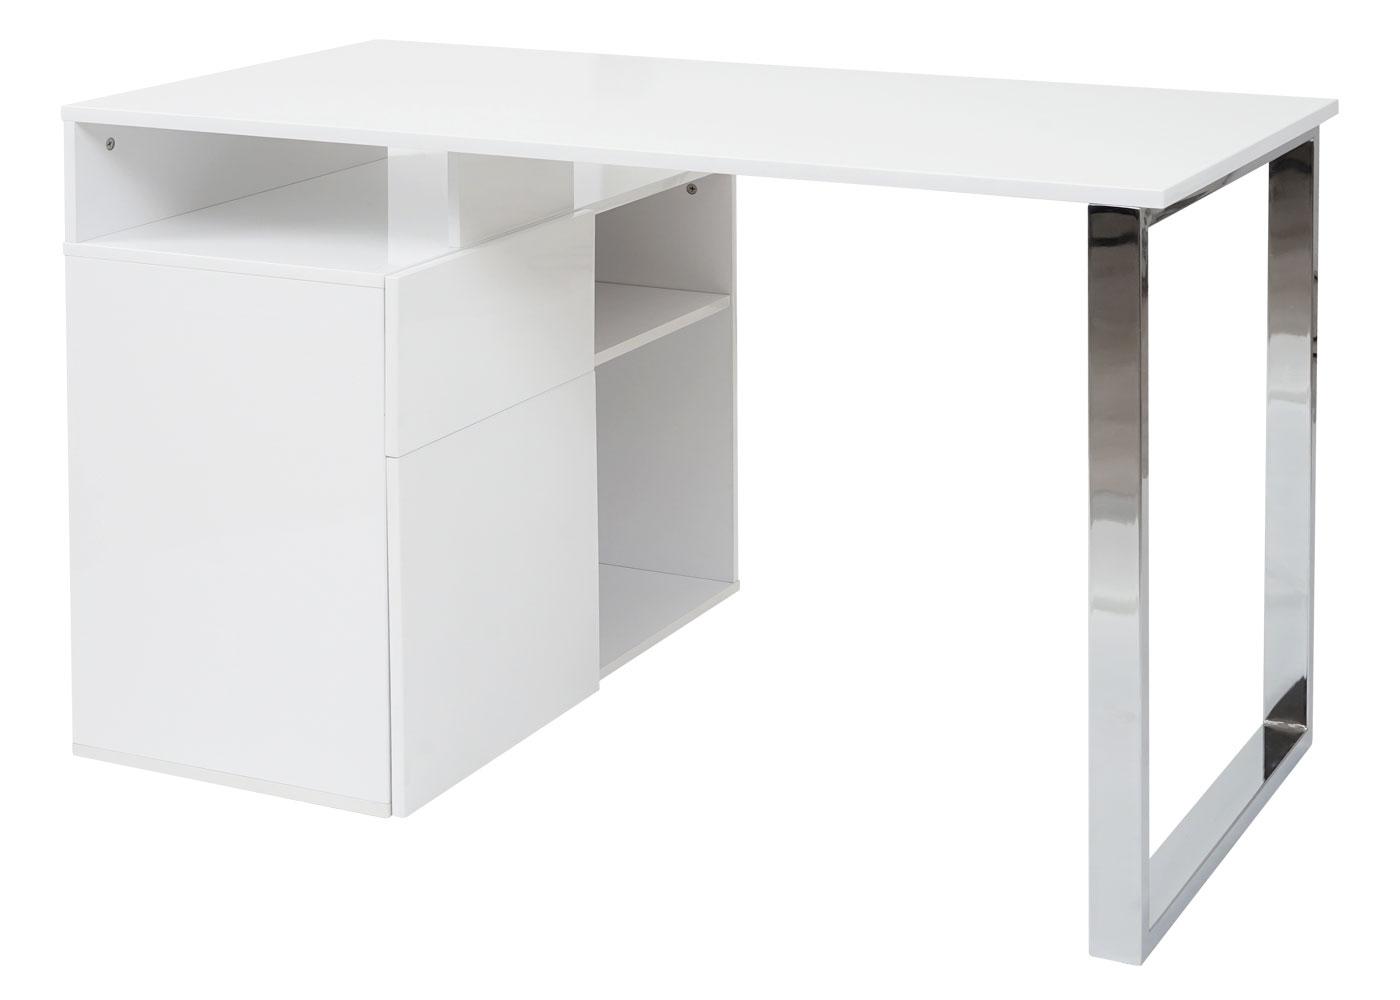 eckschreibtisch b rotisch hwc hochglanz weiss 120x60cm. Black Bedroom Furniture Sets. Home Design Ideas